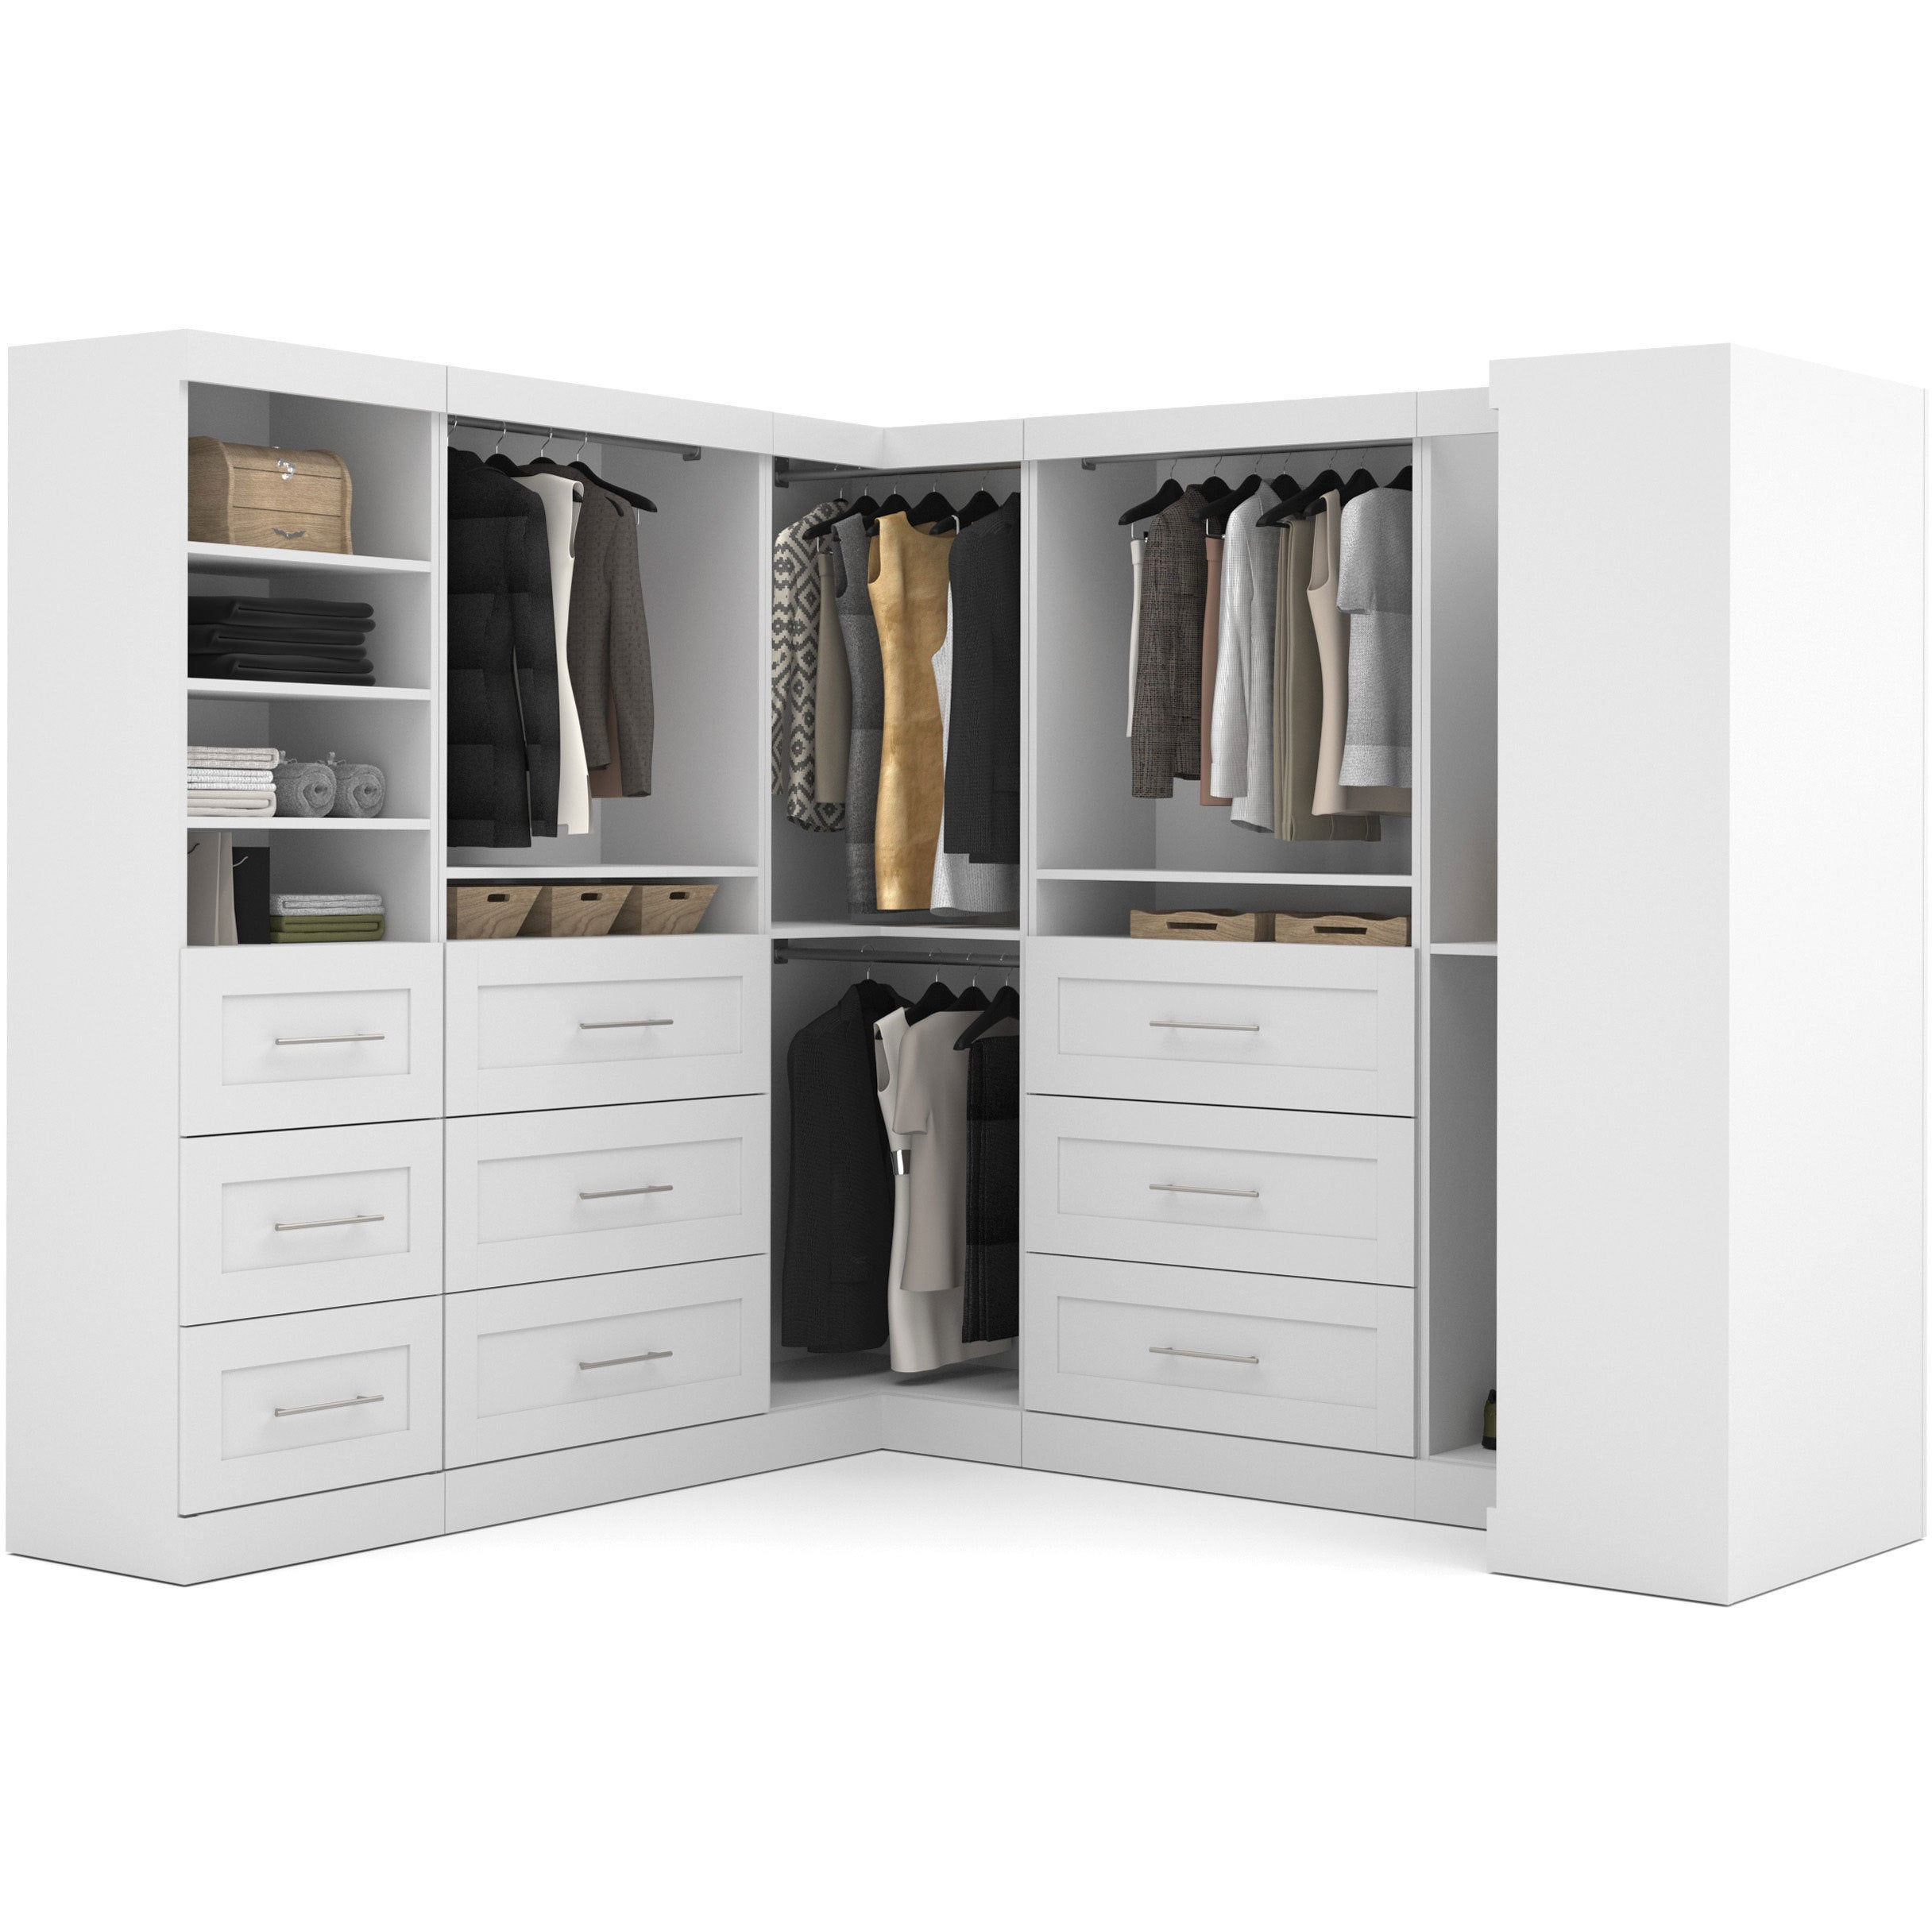 Pur By Bestar Optimum Corner Walk In Closet Organizer Set   Free Shipping  Today   Overstock   16812744